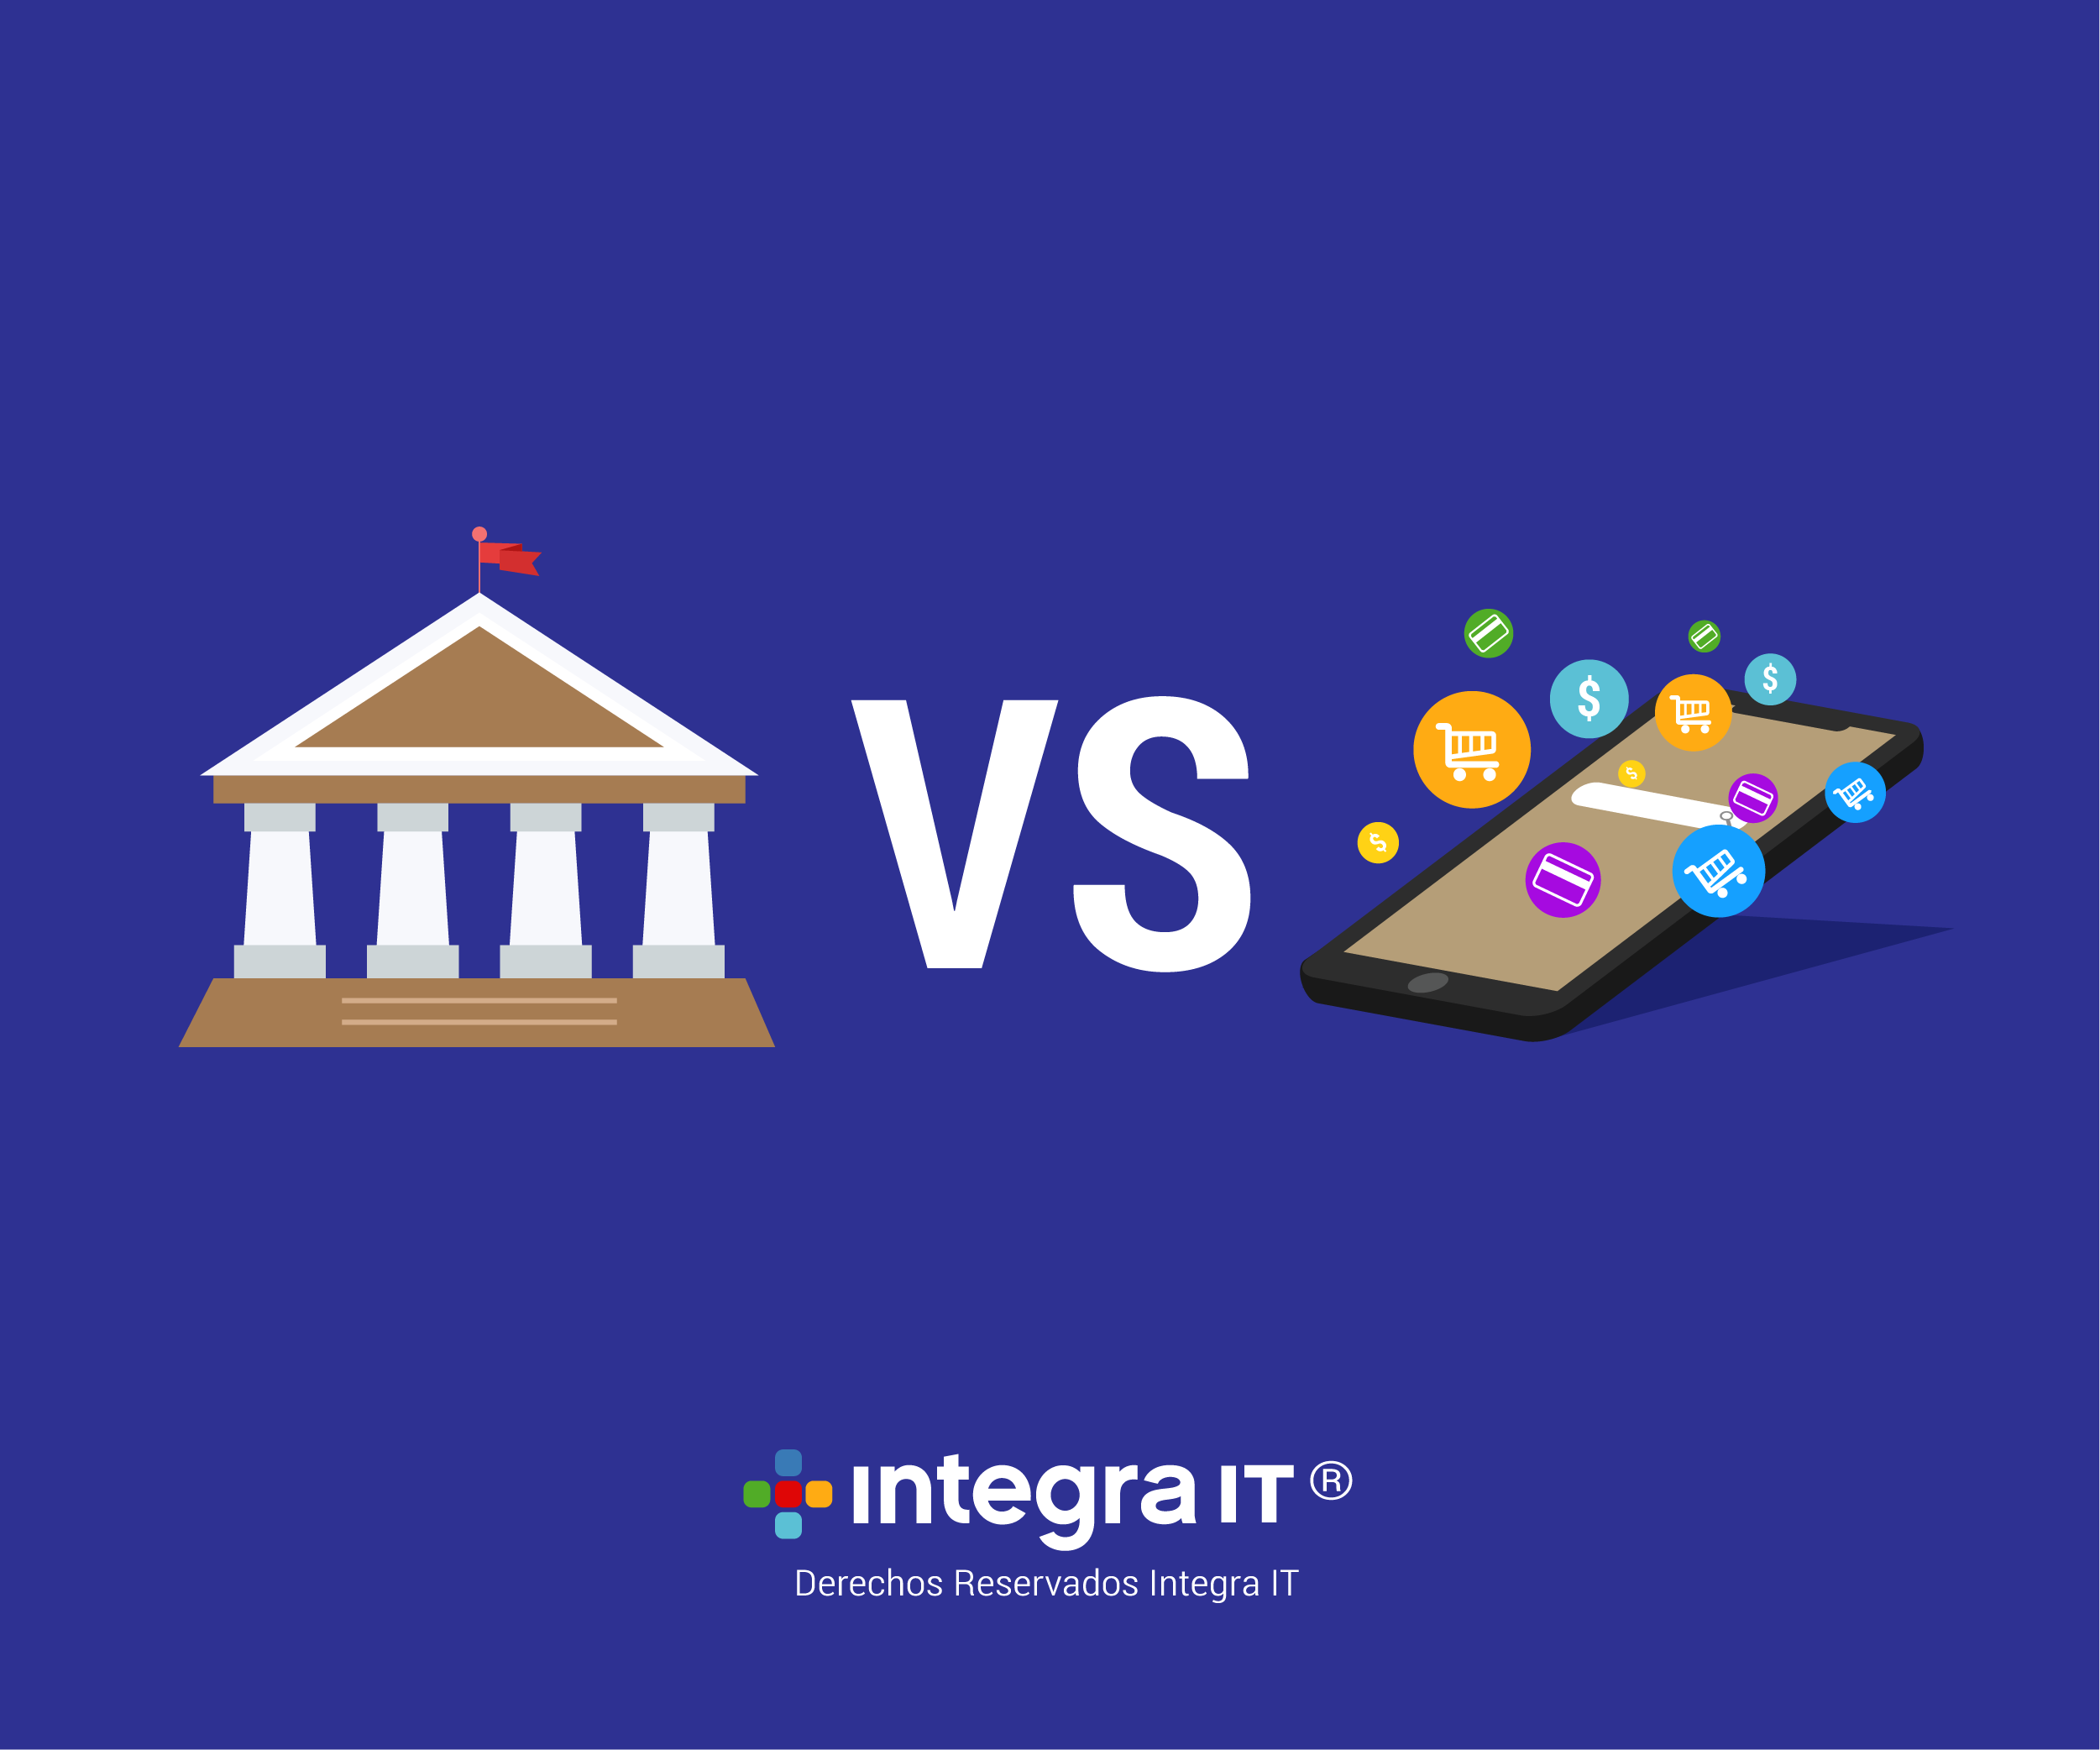 Fintech vs banca tradicional en el mundo digital